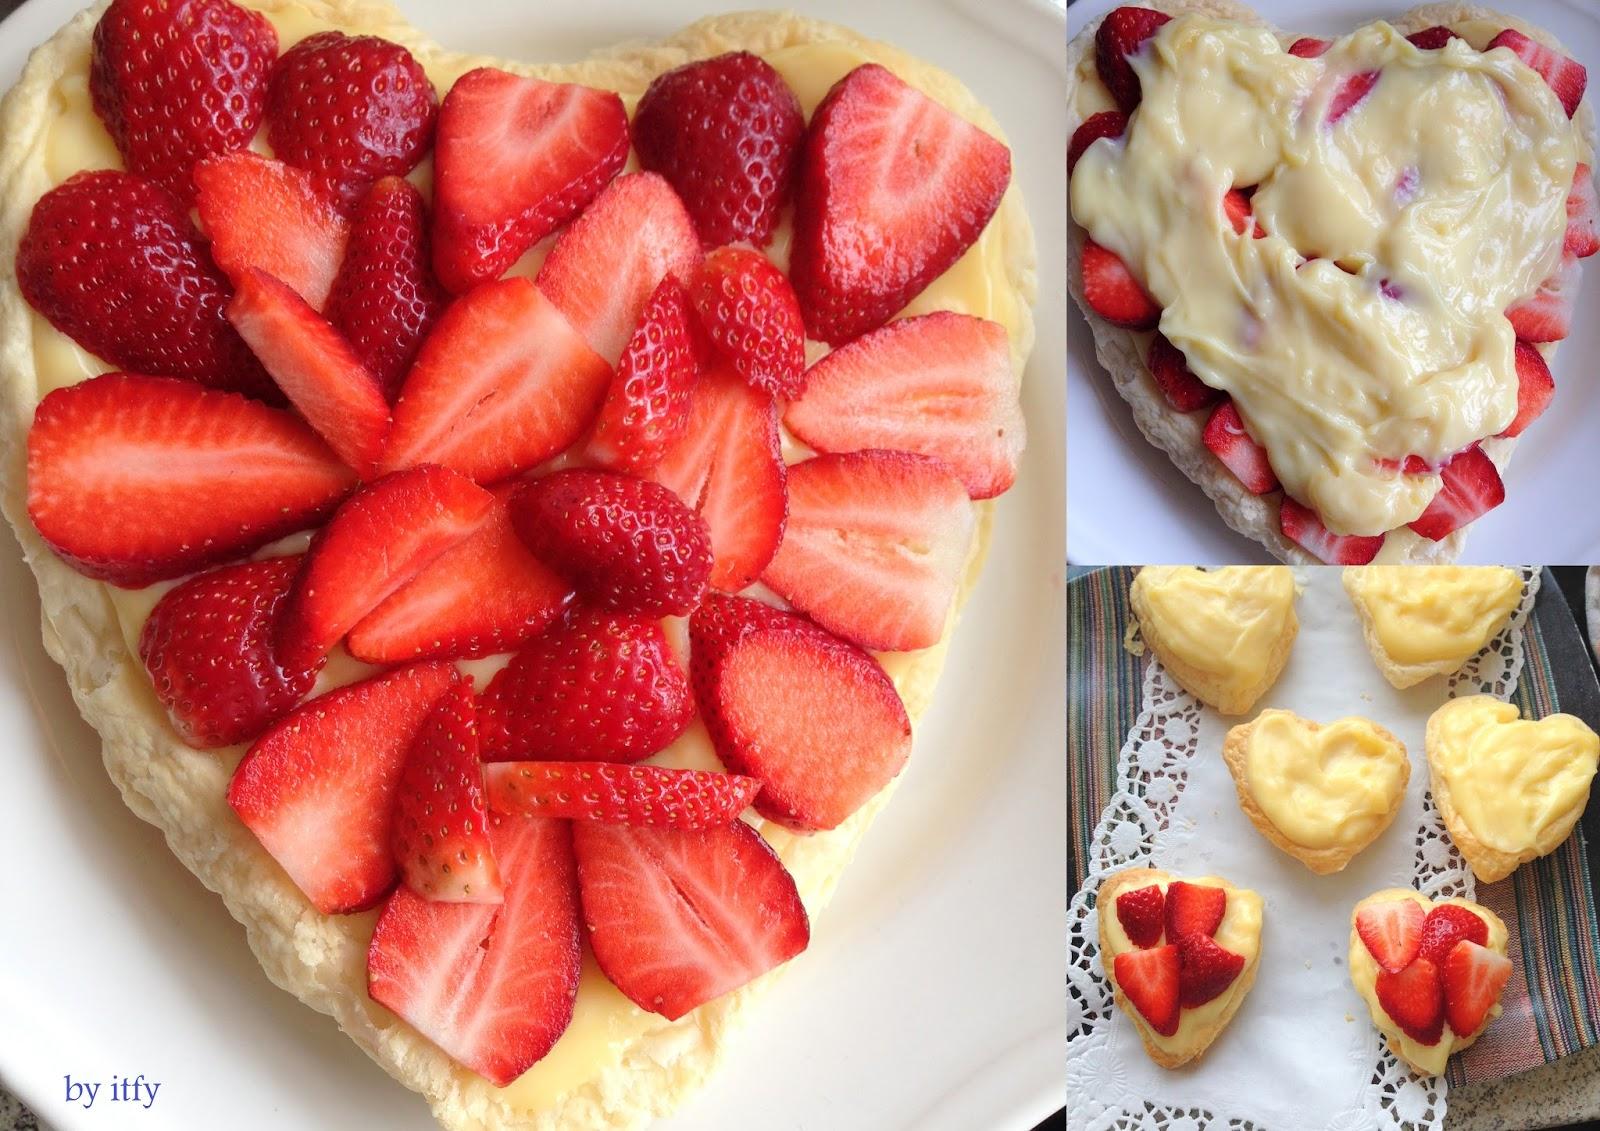 I Test For You Sonntagskuchen Blatterteig Vanille Erdbeere